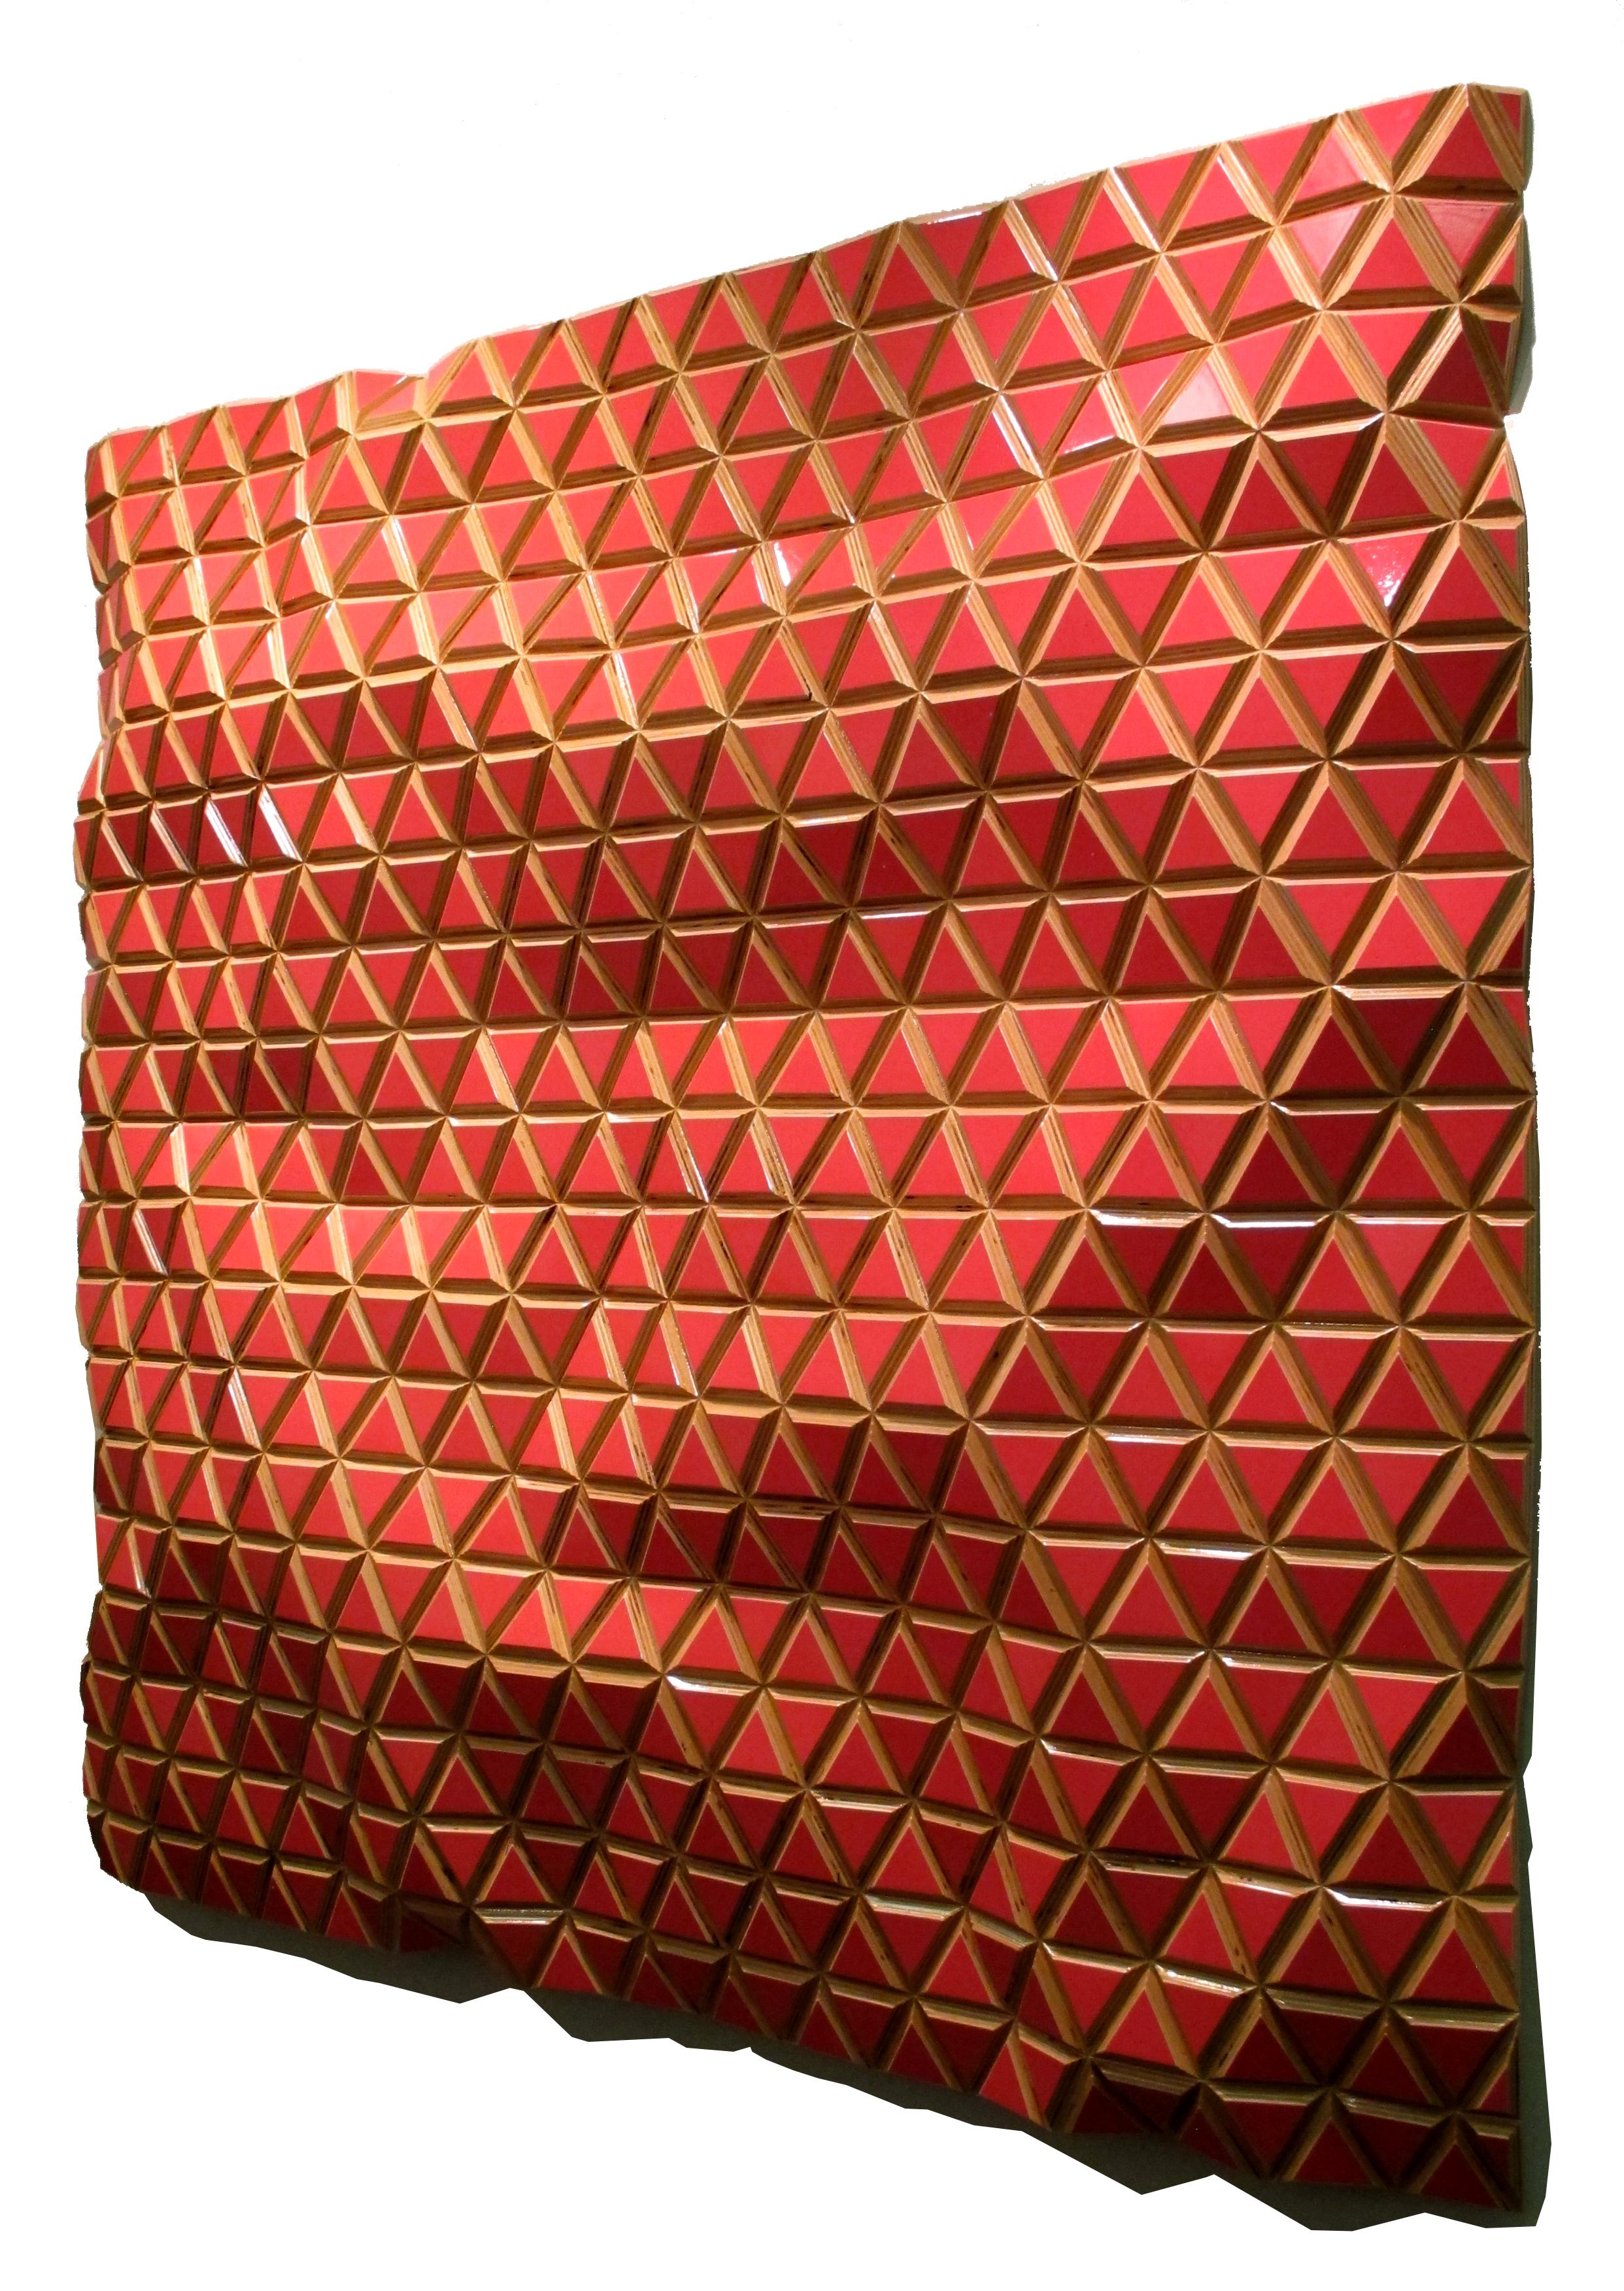 HGU_Flexible Rigids-Desert Rose_57x59in_144x150cm_R1.jpg